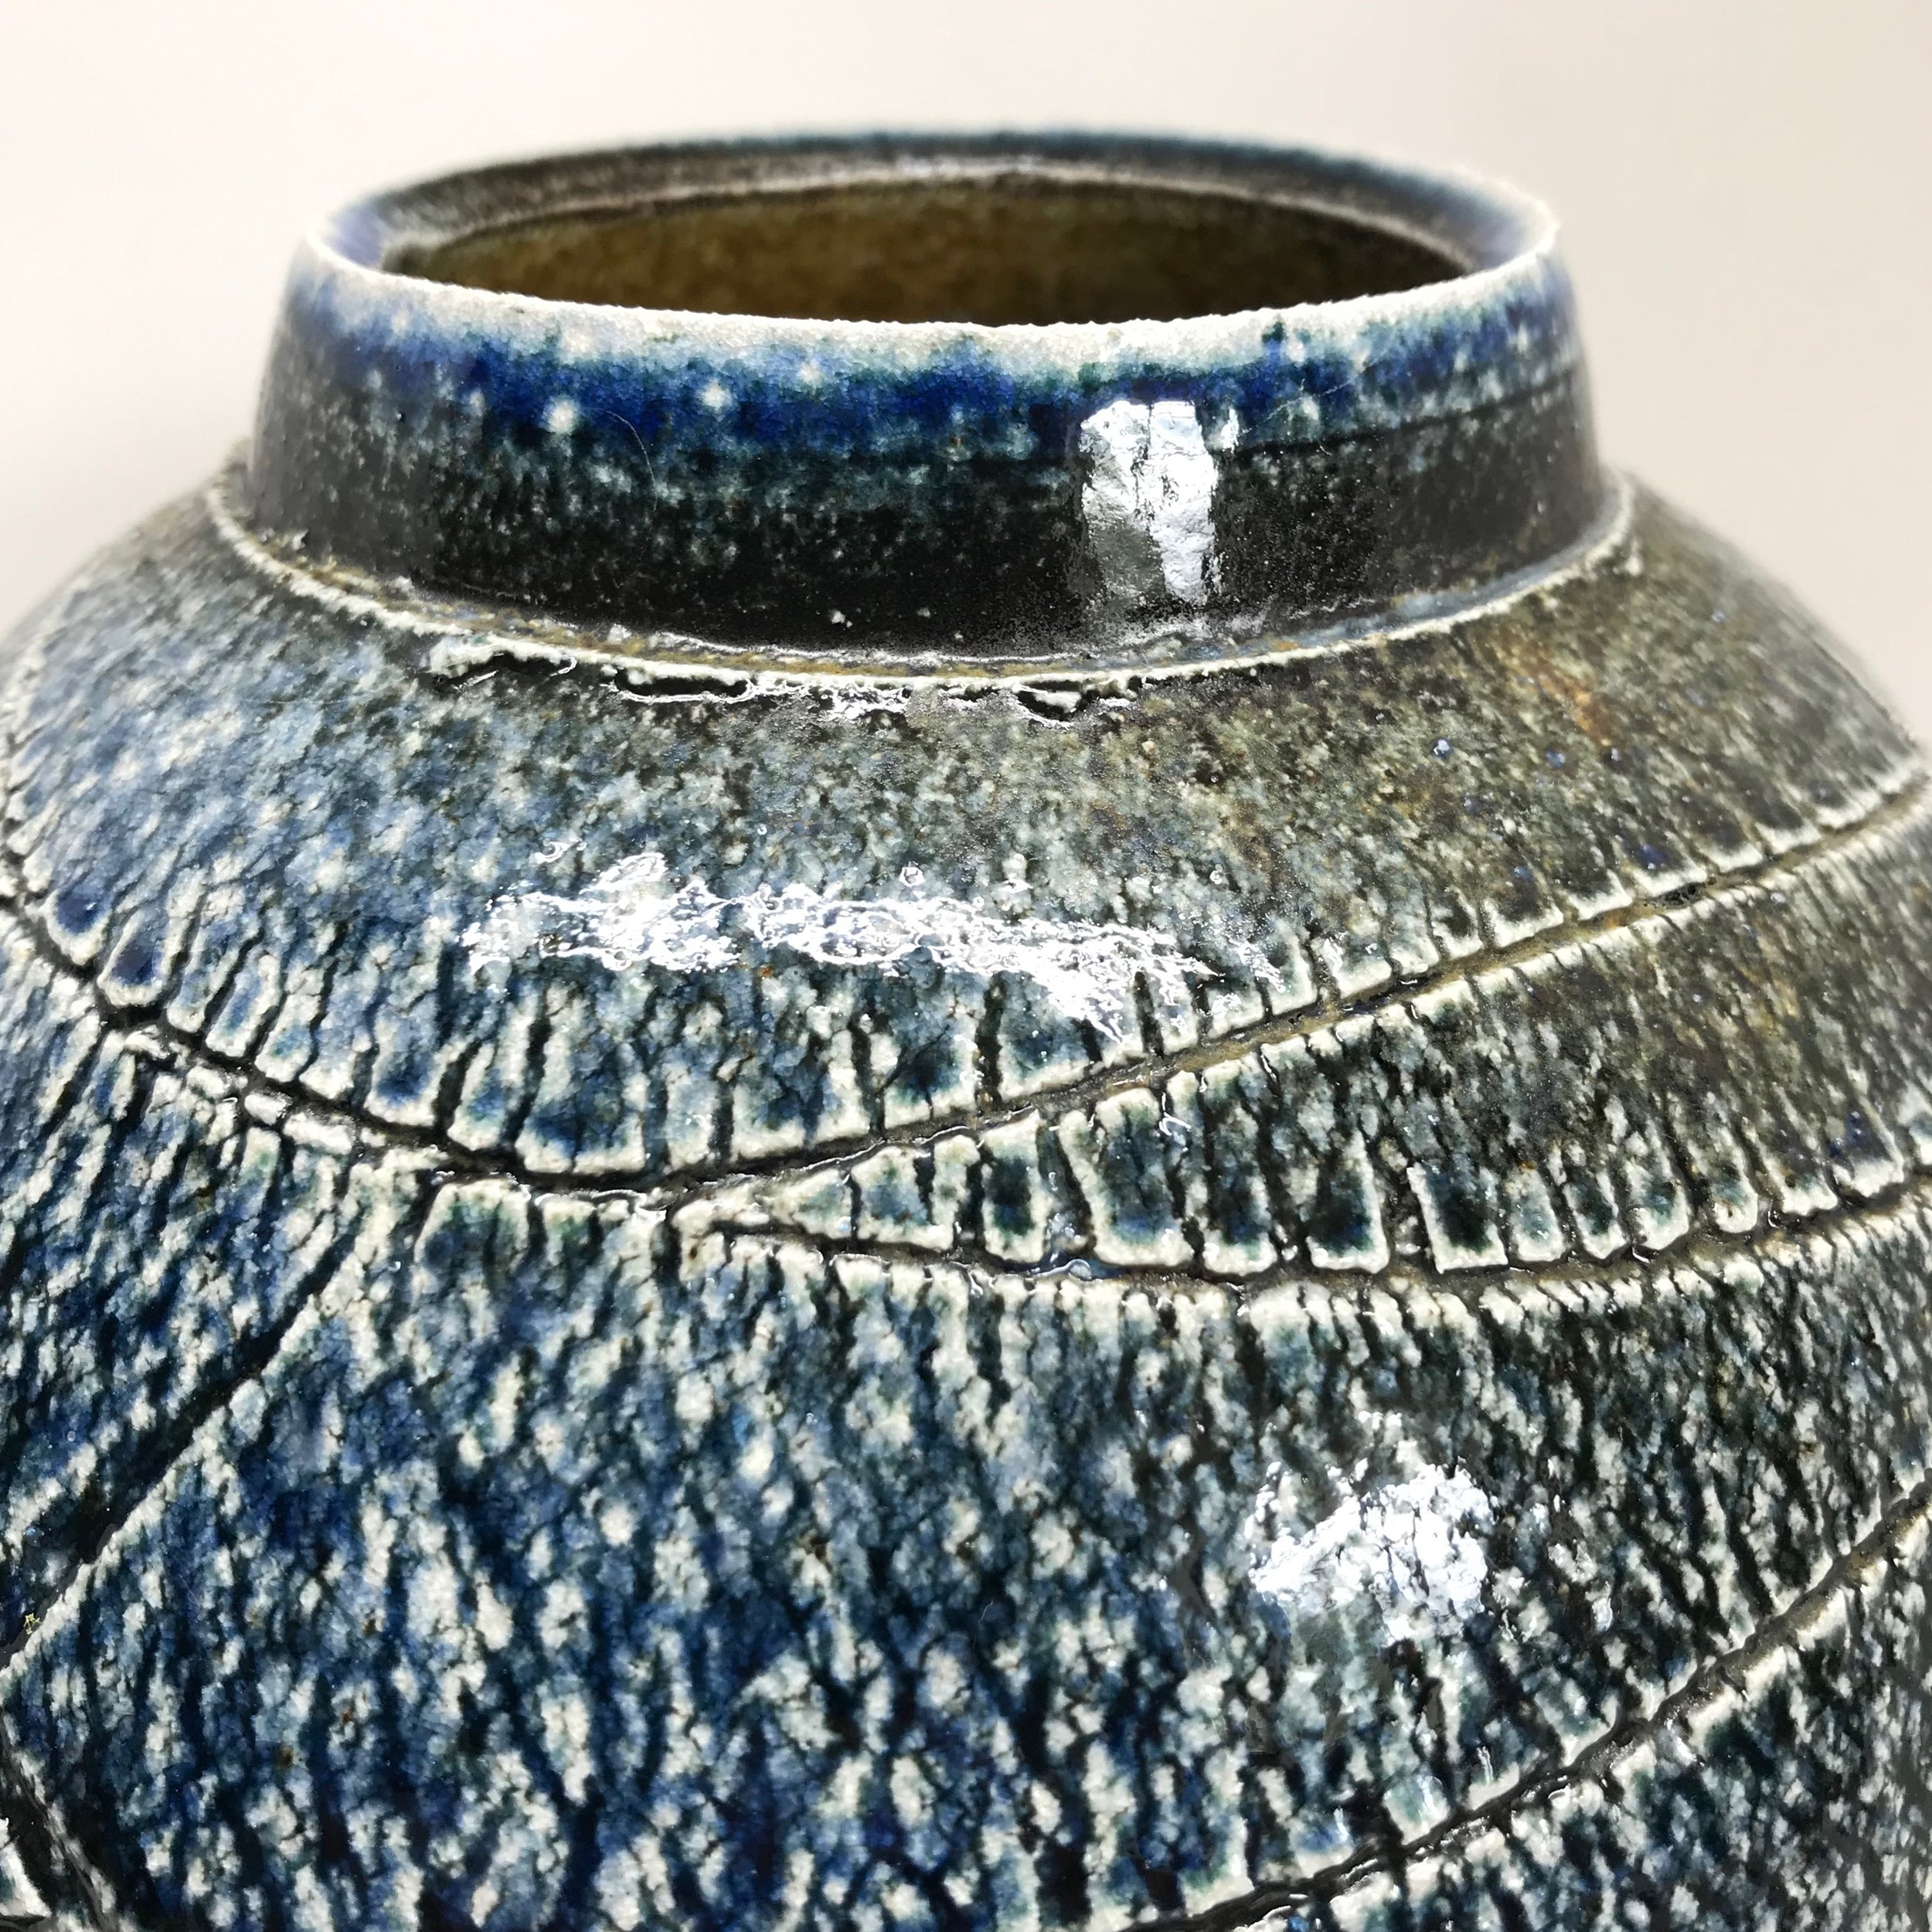 soda fired textured moon jar with wood ash